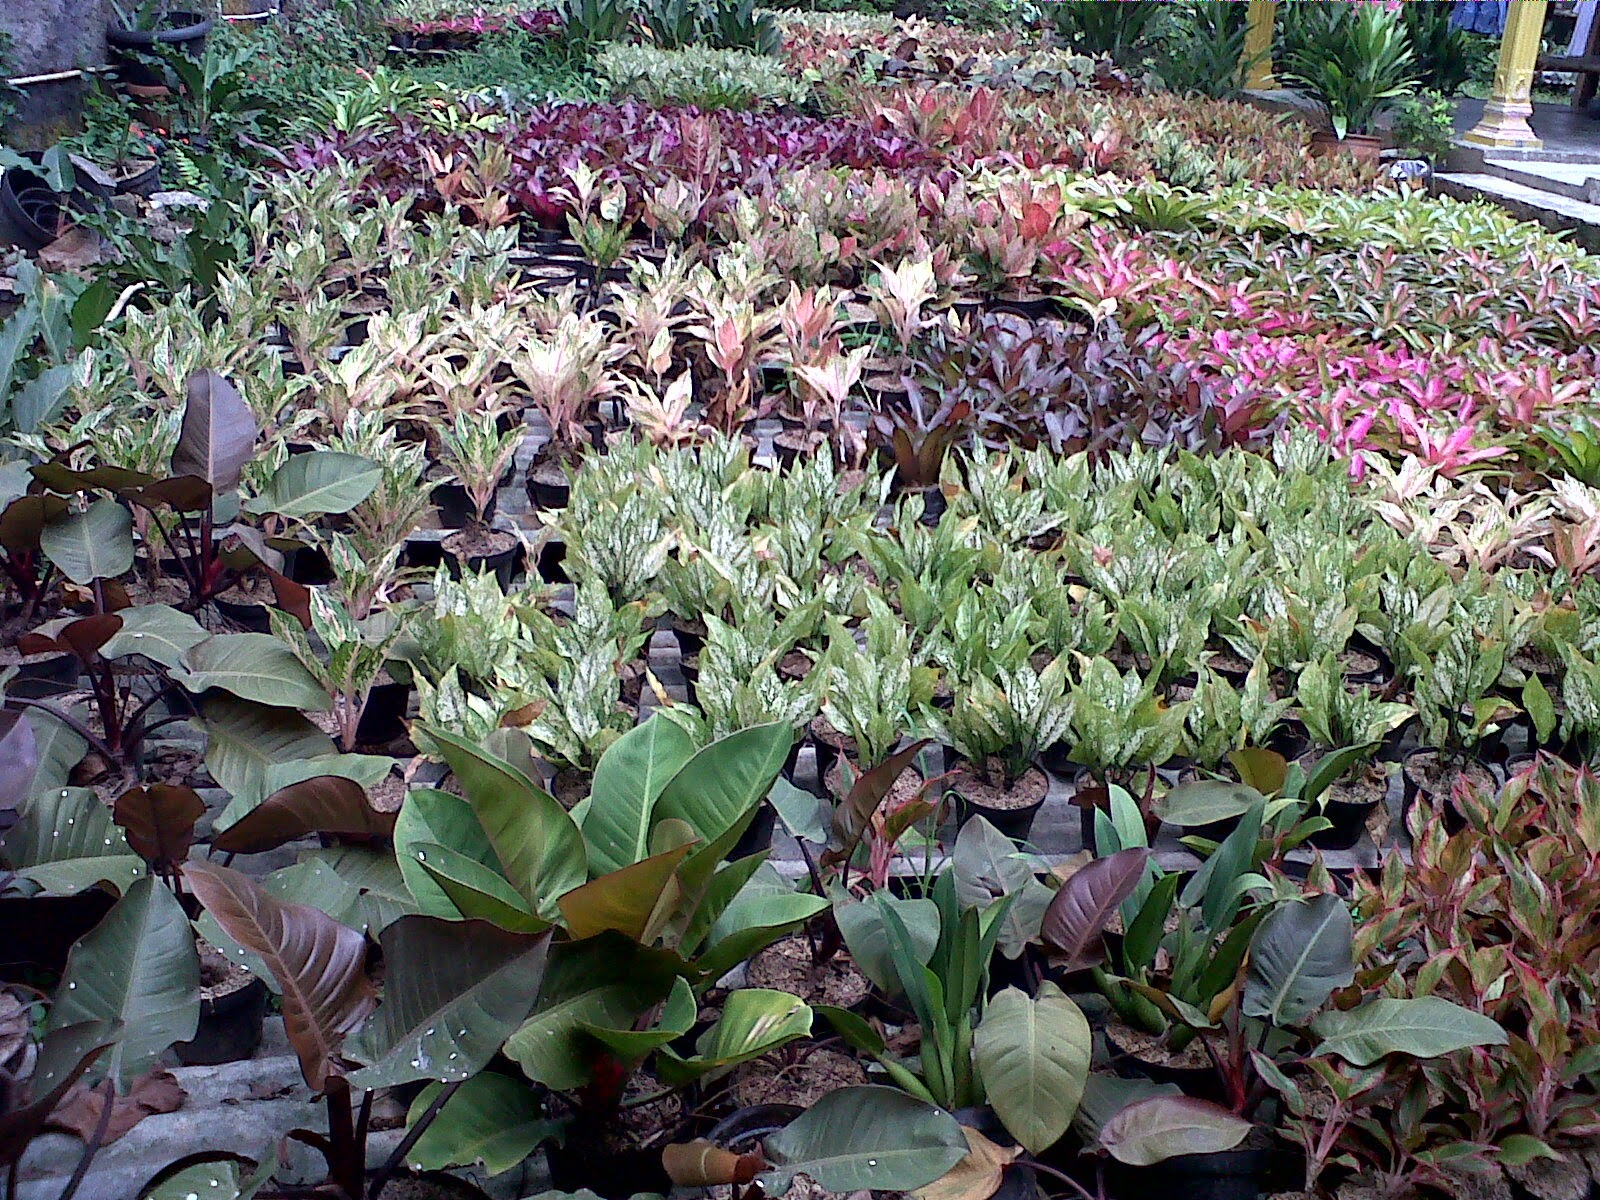 Jual aneka bromelia | Suplier tanaman hias | Jasa tukang taman | Renovasi taman